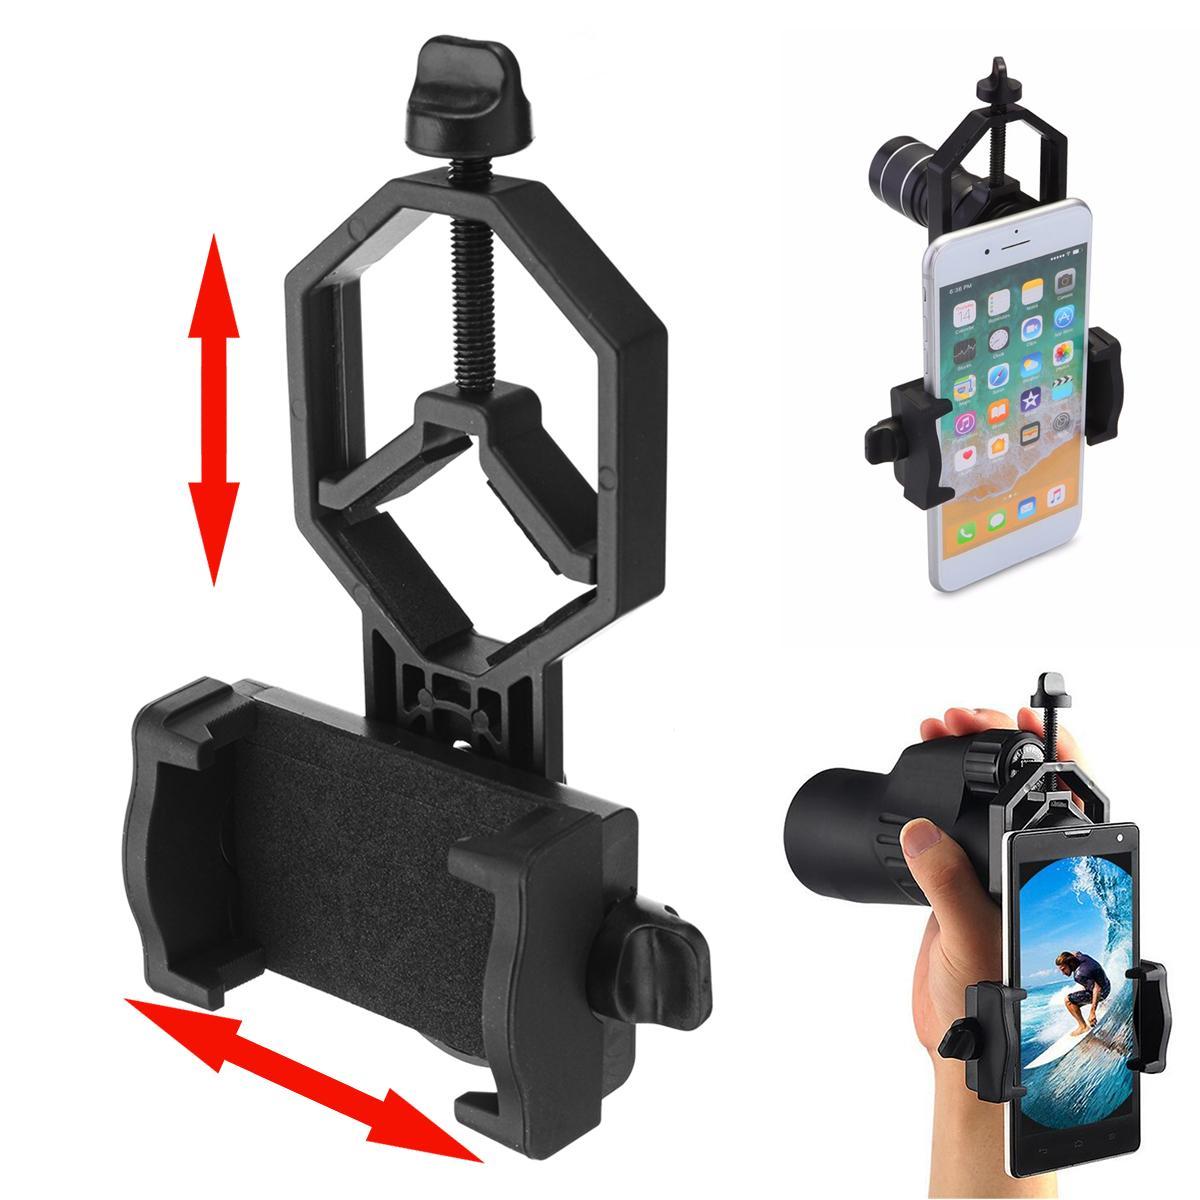 Suporte de Smartphone para Binóculos, Telescópios, Lunetas, etc